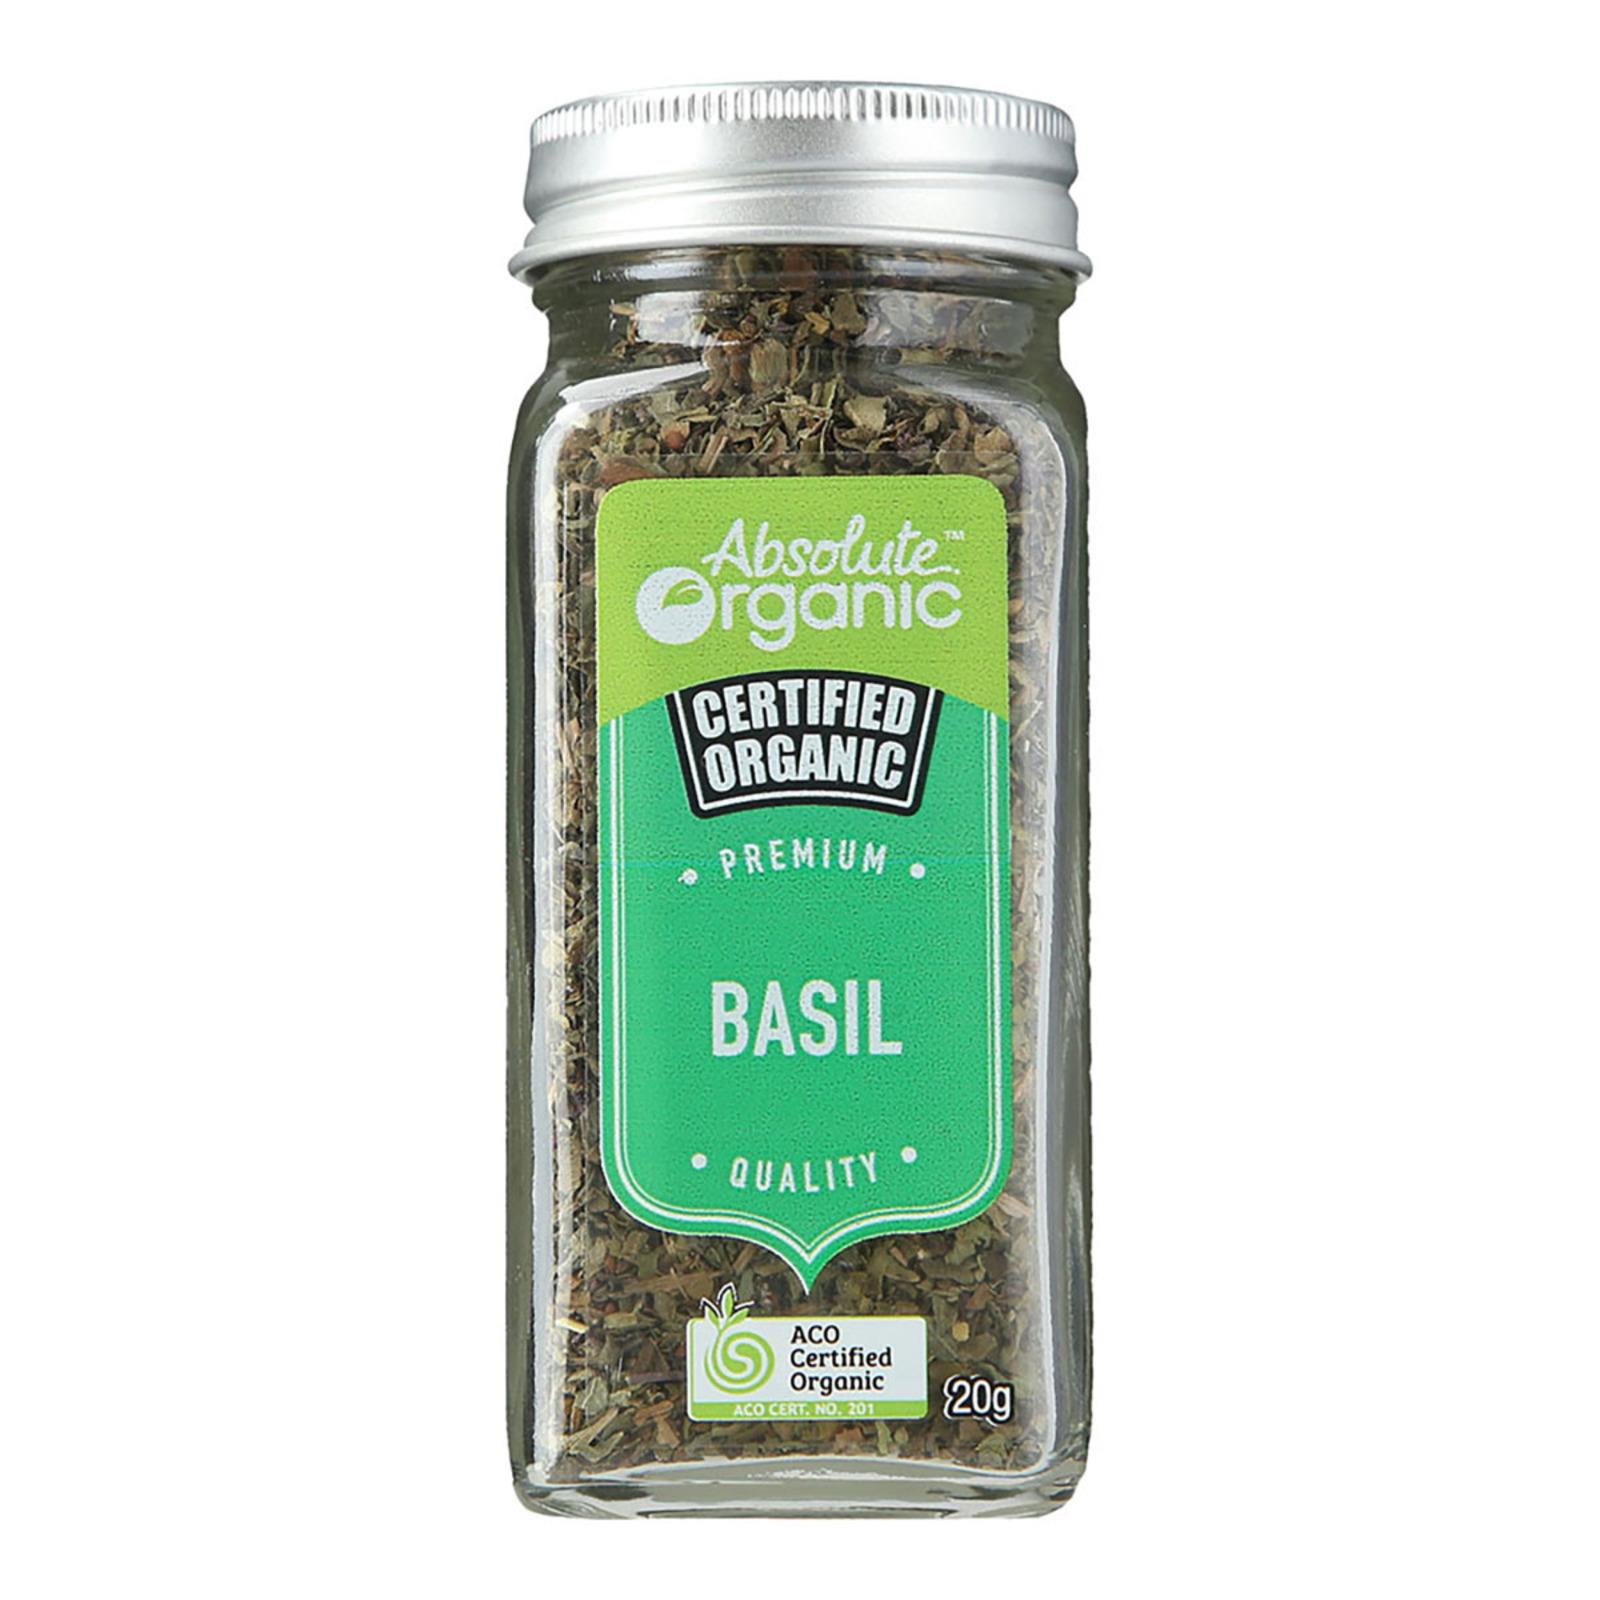 Absolute Organic Basil